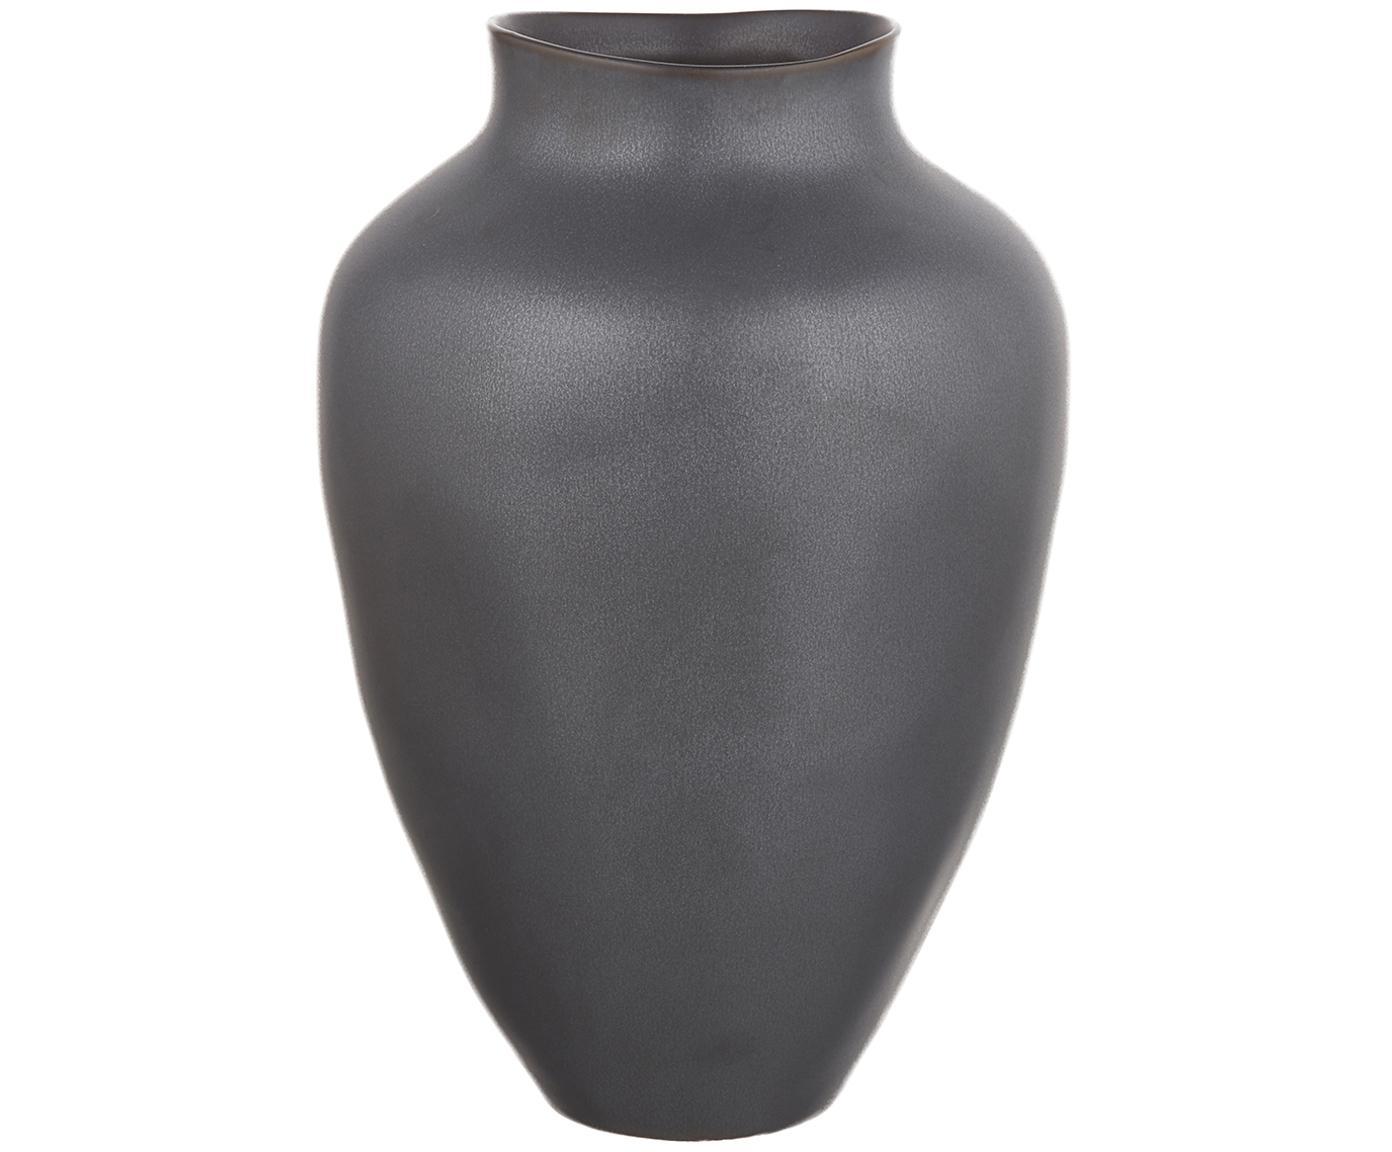 Vaas Latona, Keramiek, Mat zwart, Ø 21 x H 30 cm